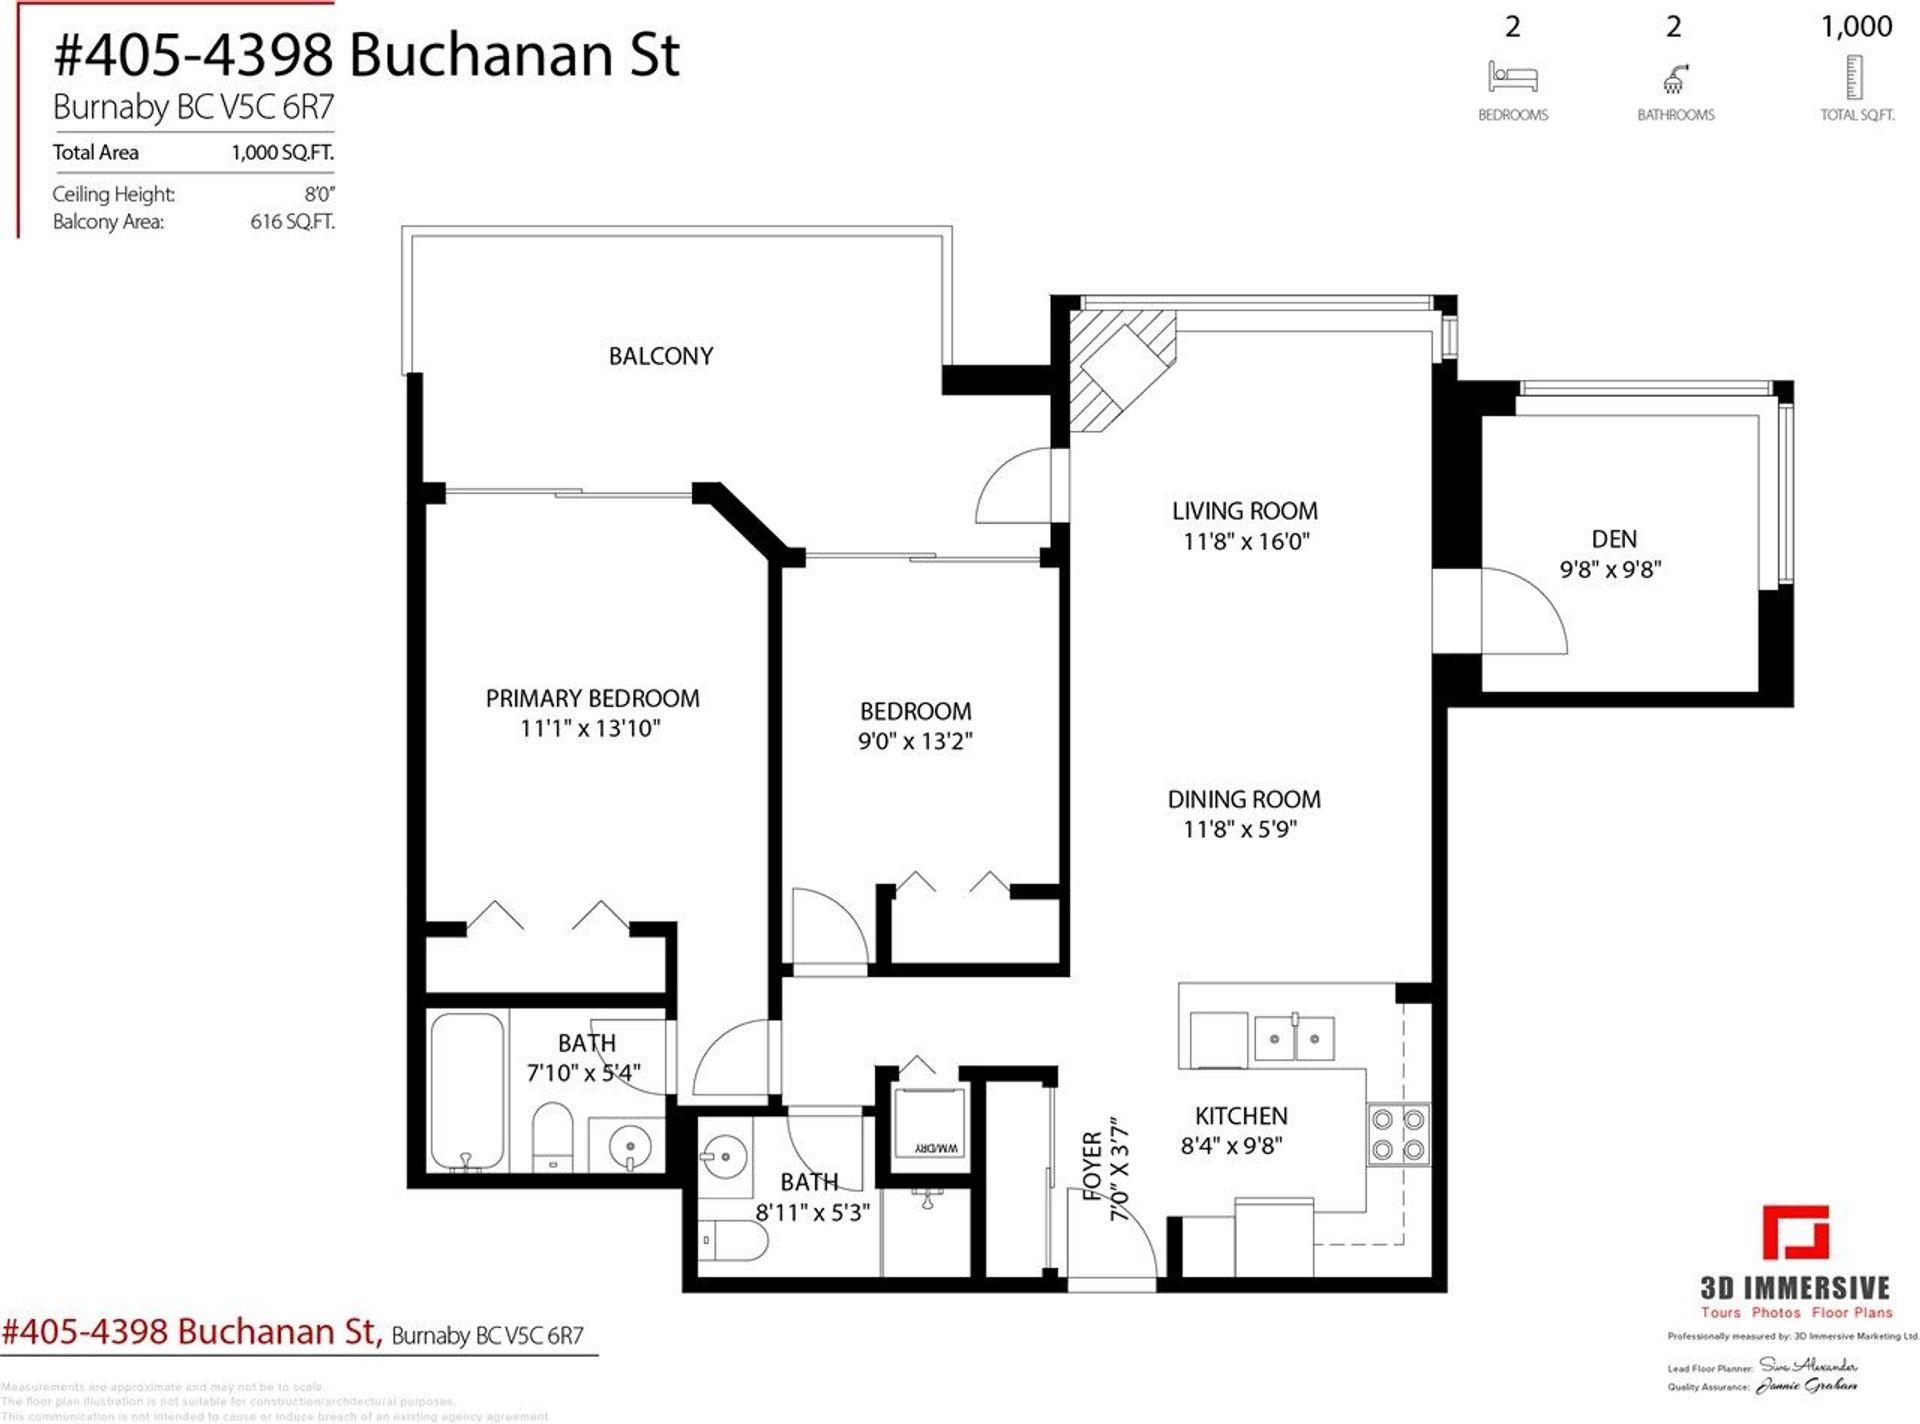 4398-buchanan-street-brentwood-park-burnaby-north-22 at 405 - 4398 Buchanan Street, Brentwood Park, Burnaby North